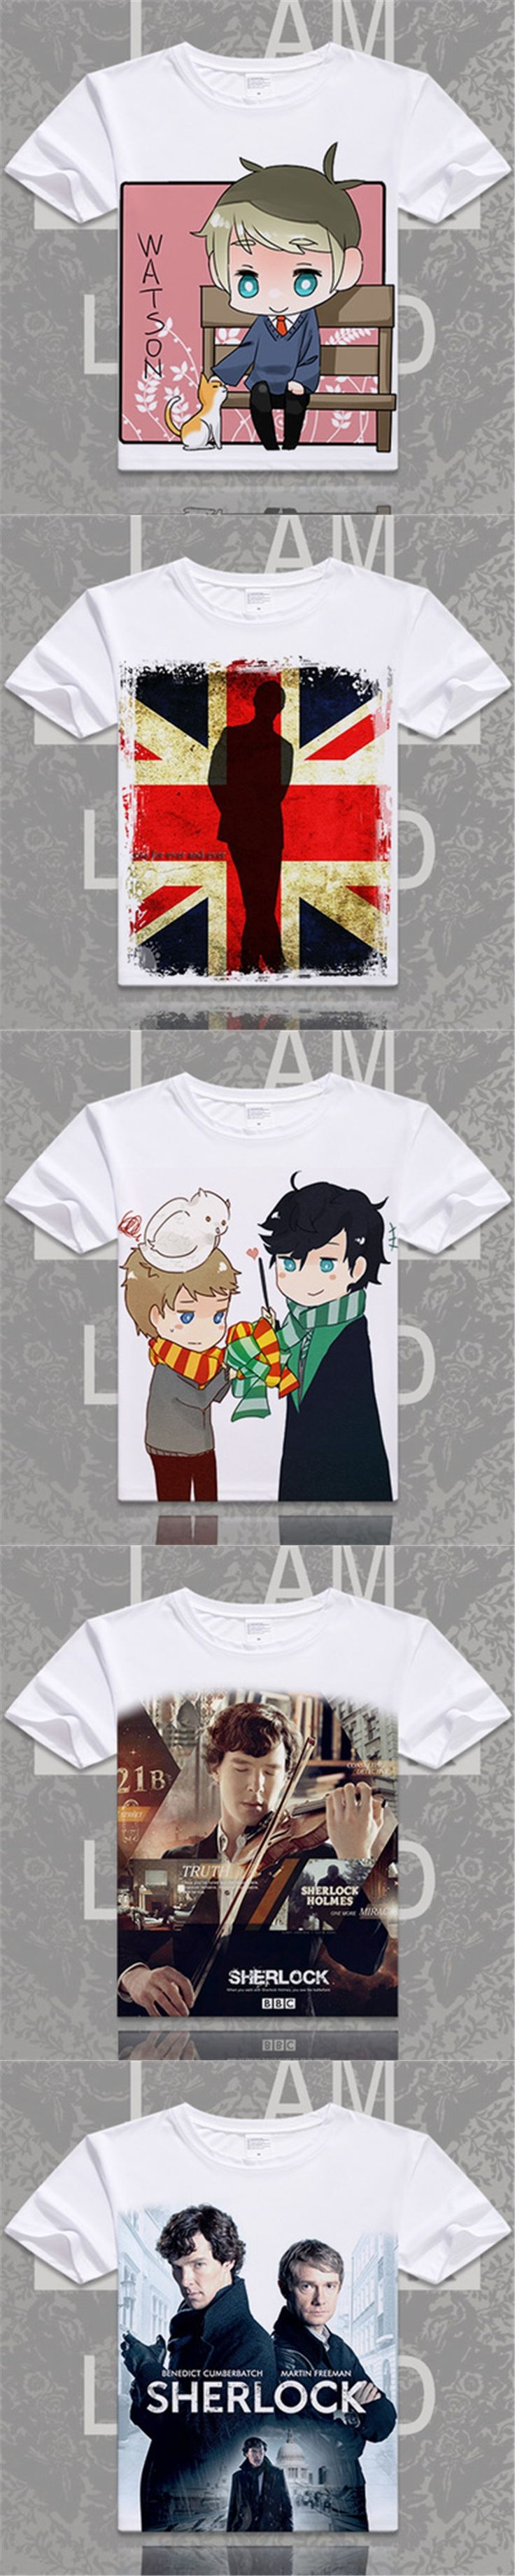 Fashion Movie Sherlock Holmes Printed O-Neck Short Sleeve T-shirts John H Watson Casual Tops Tees